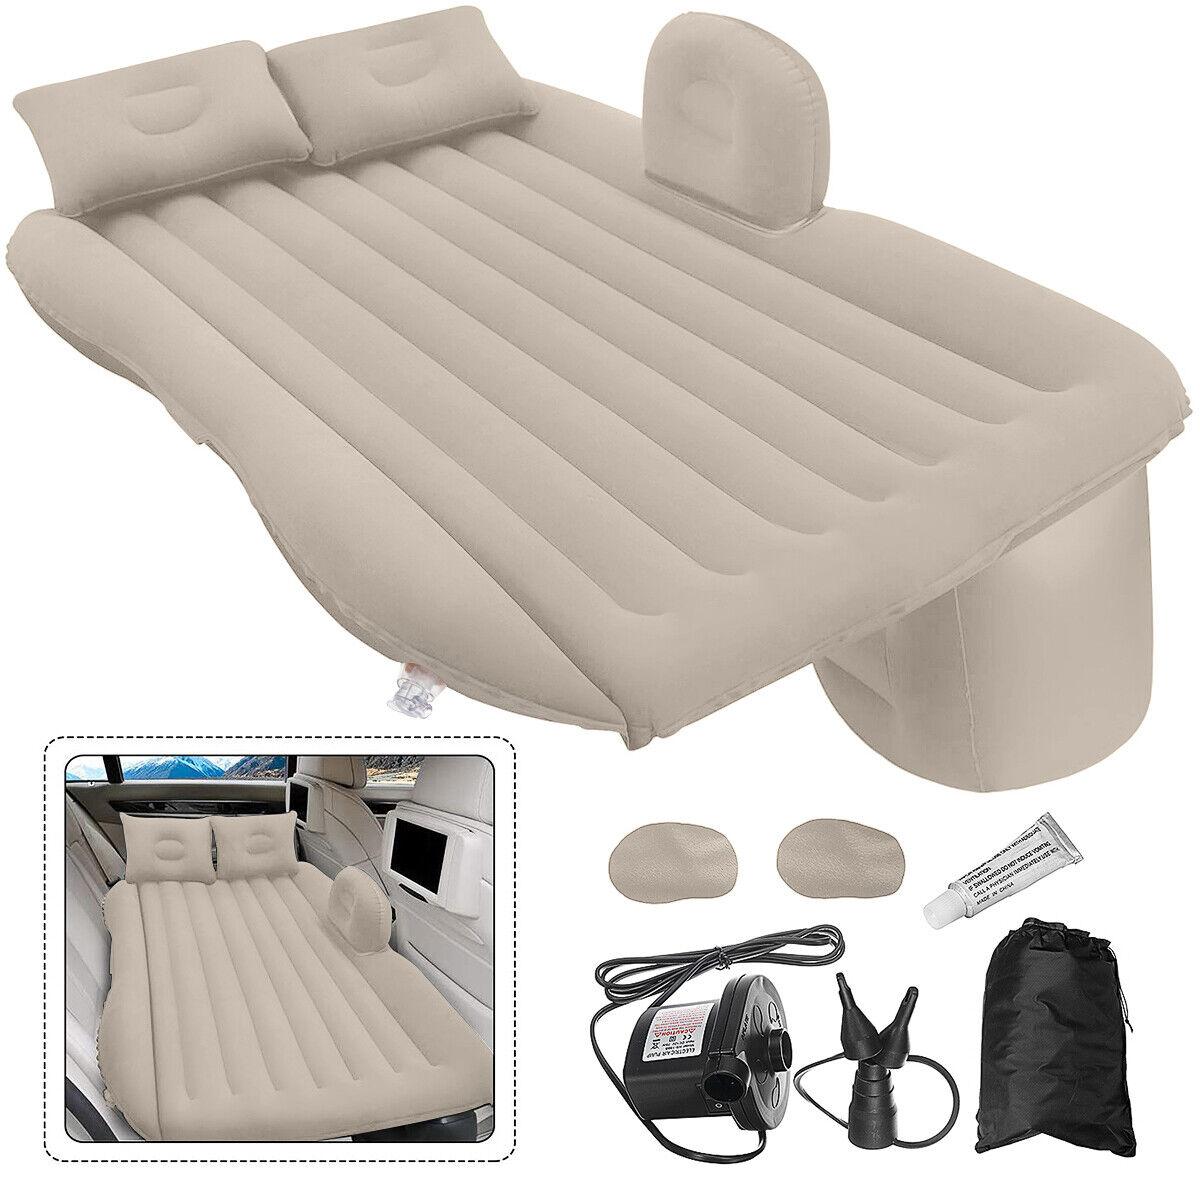 soft flocked pvc car inflatable bed back